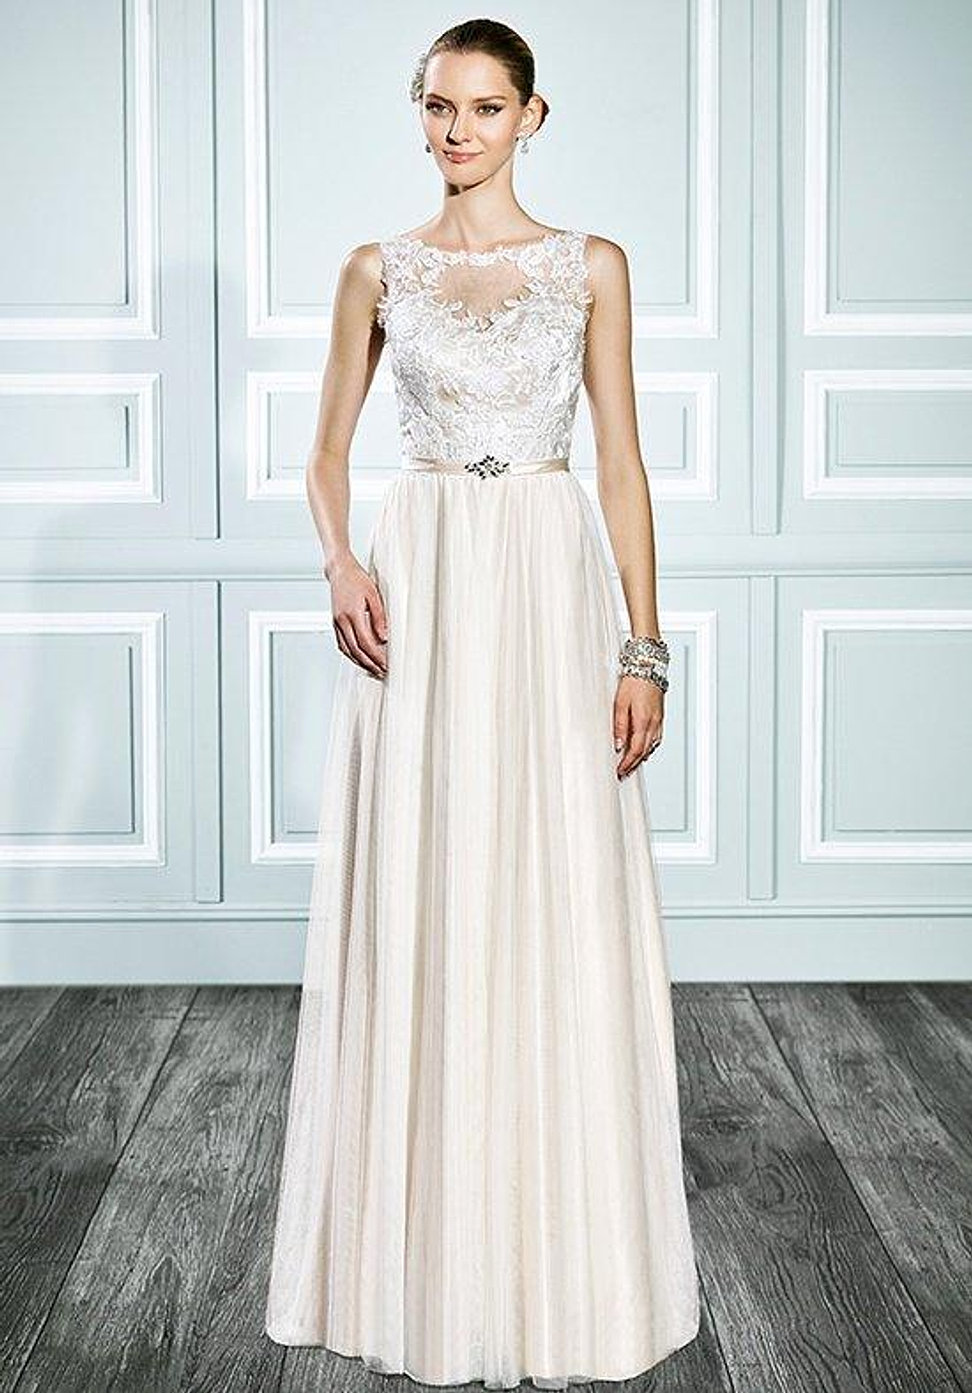 Robe courte rose pРіСћle